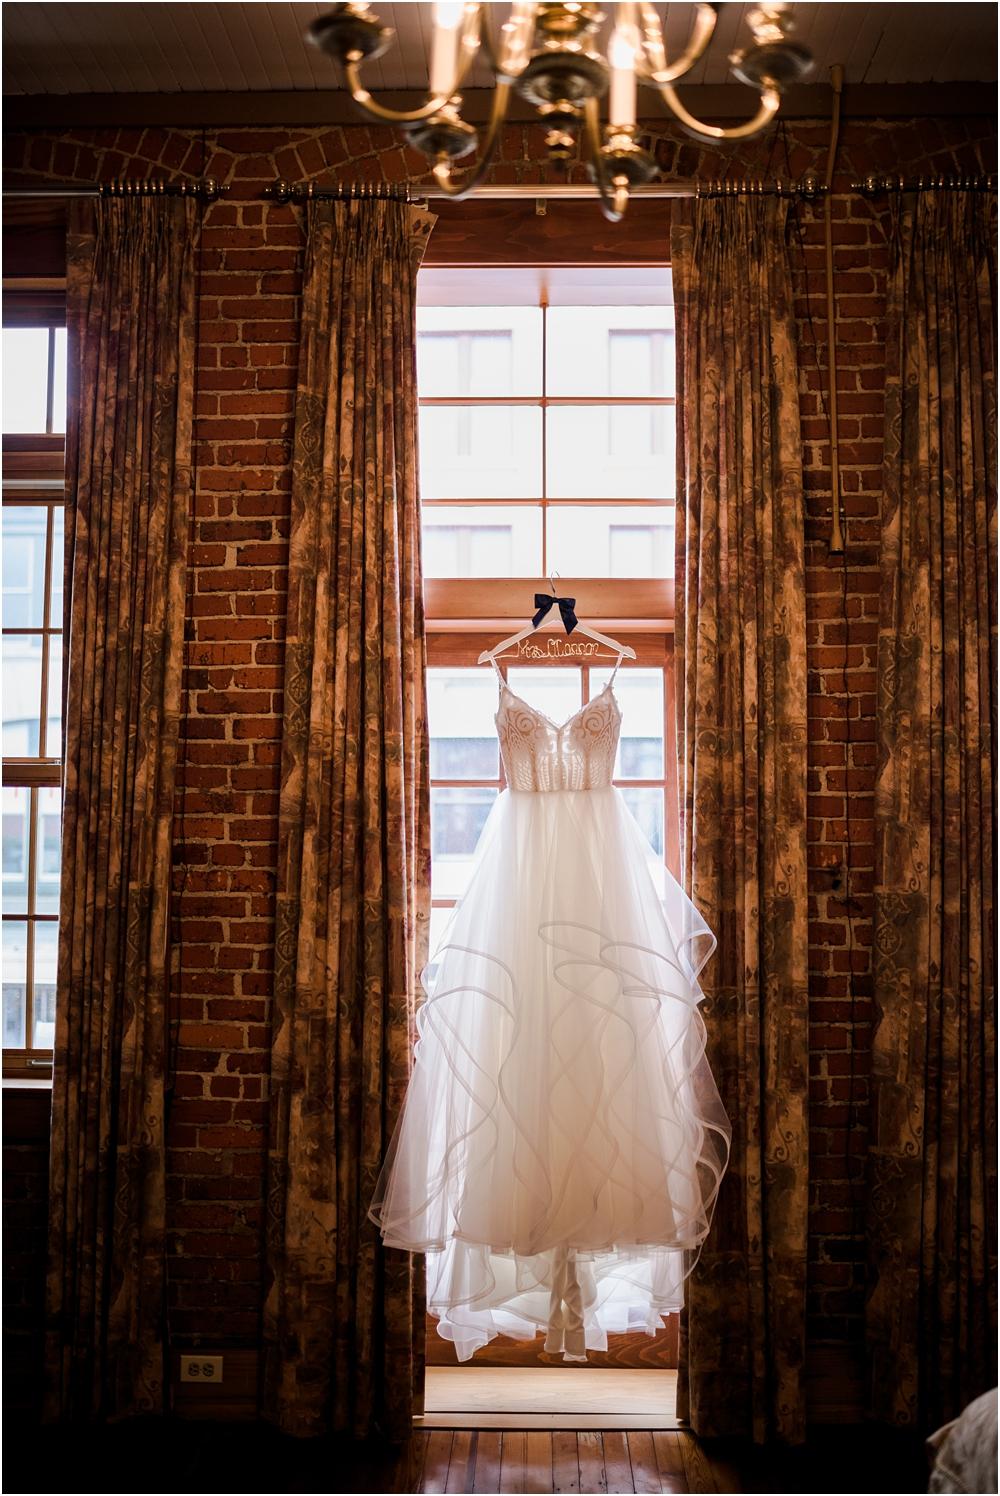 oconnor-pensacola-florida-wedding-photographer-kiersten-taylor-4.jpg